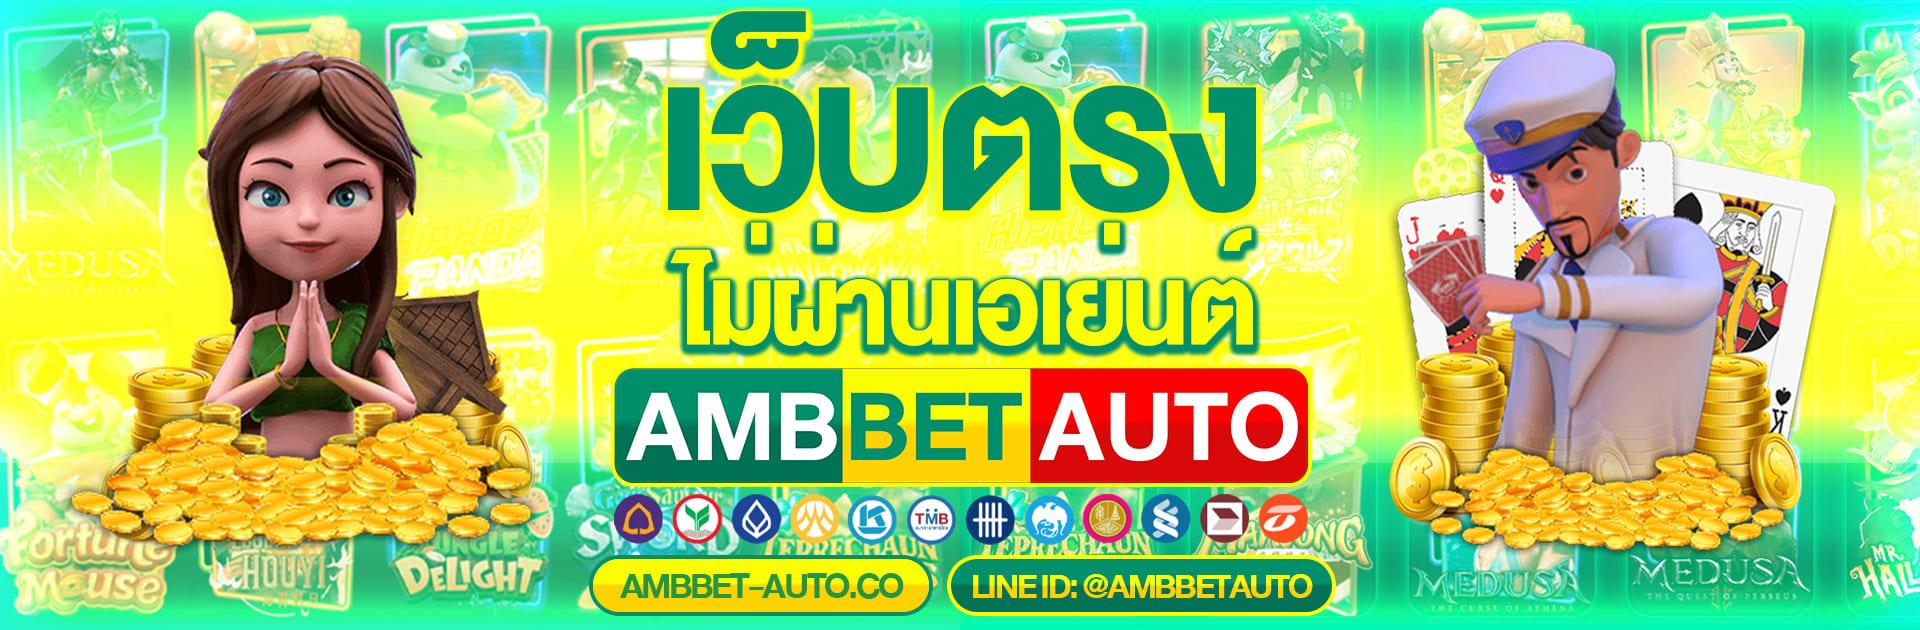 AMBBET-AUTO BG